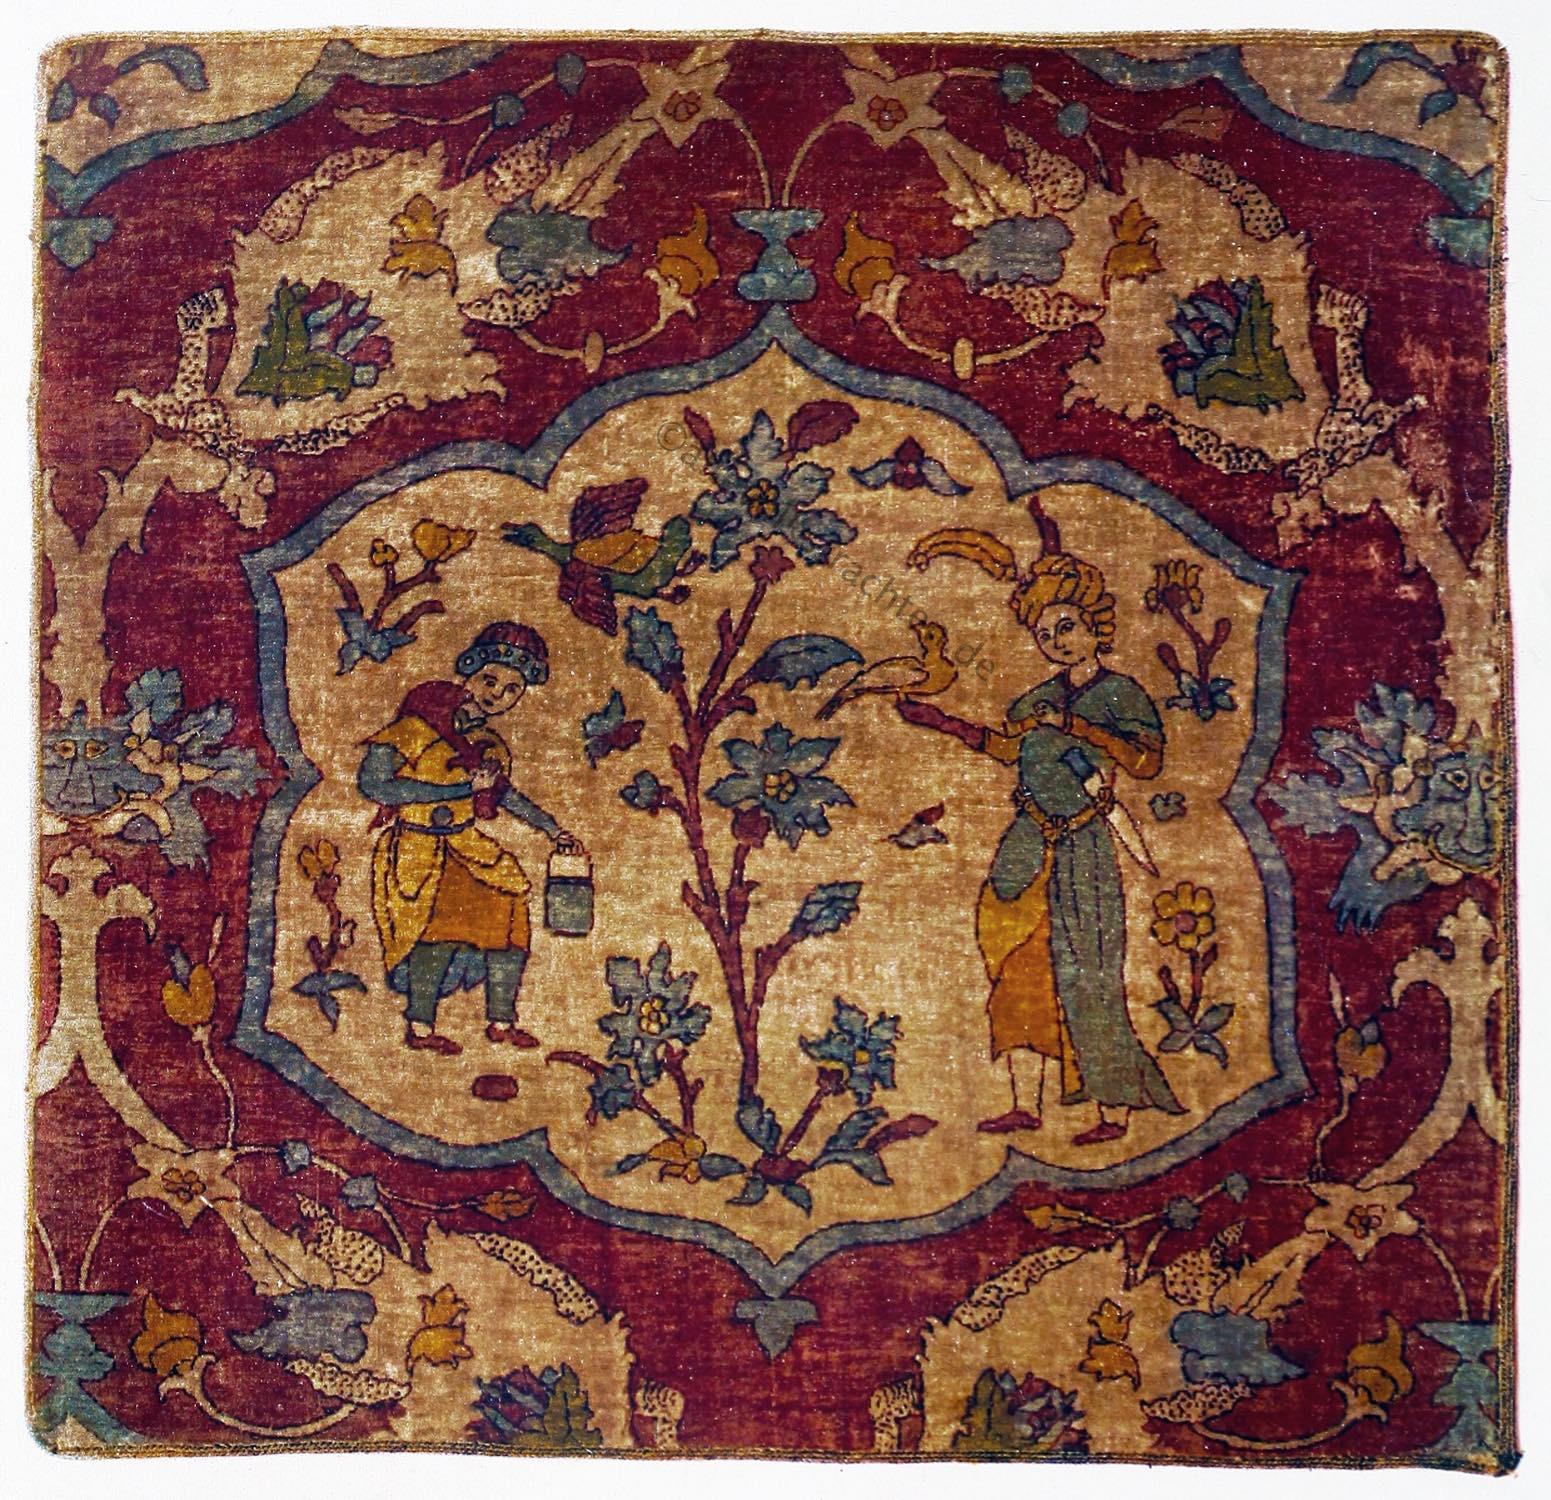 Jagdteppich, Schah-Abbas, Orient-Teppich, Seidenfragment, Kafaroffs, Perser, Teppich, Antik, Safawiden,